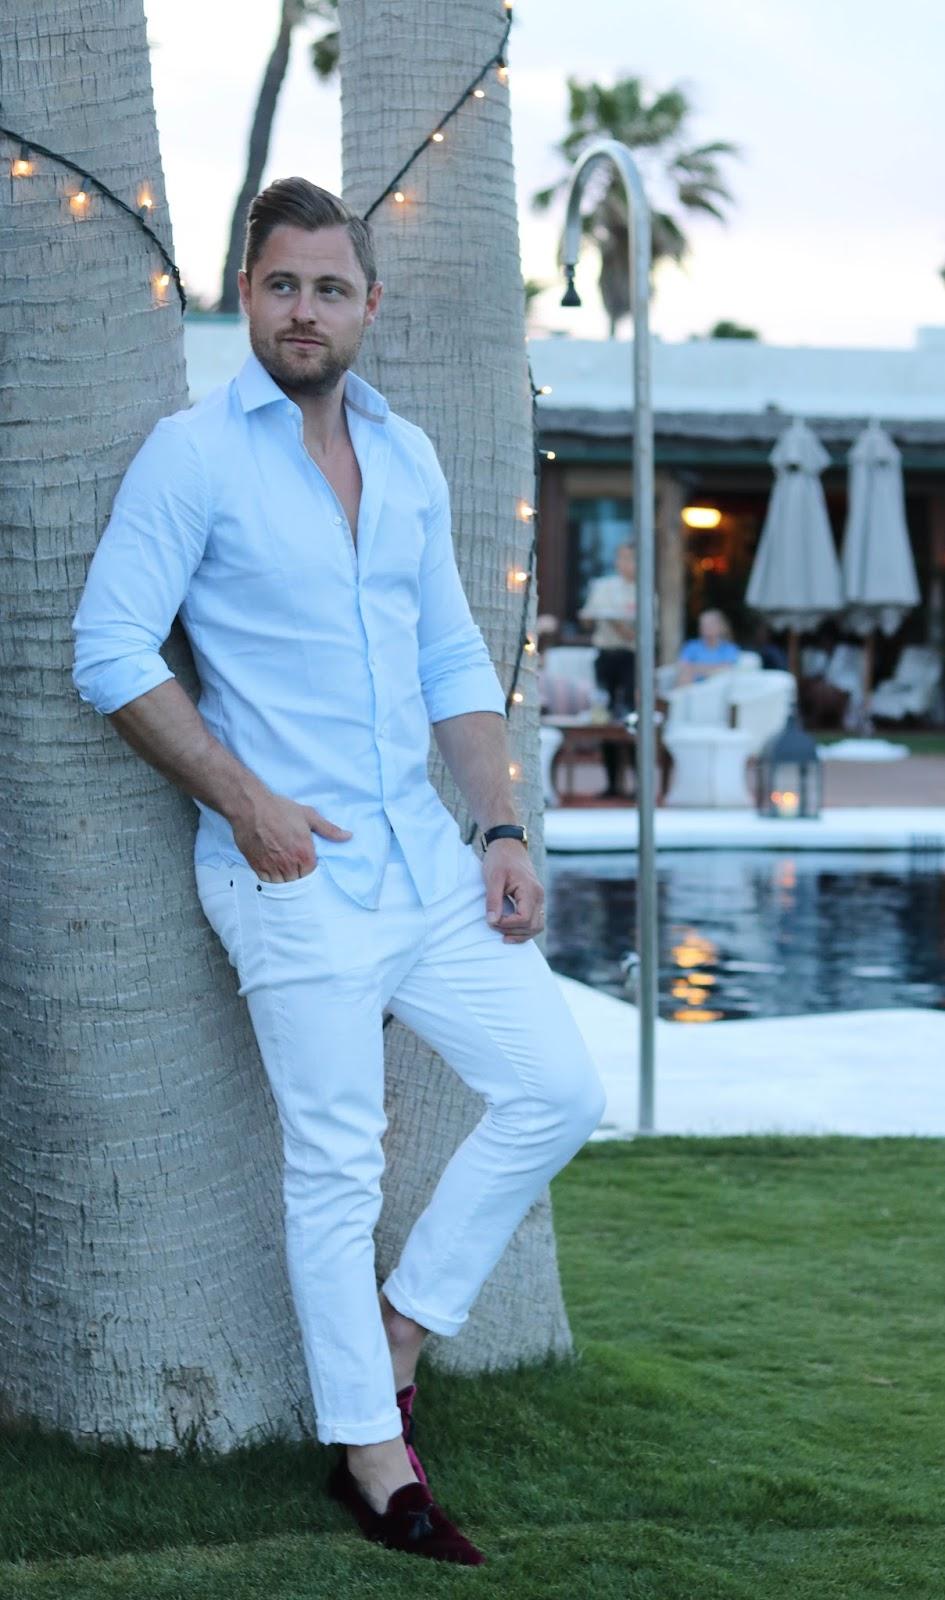 Next Menswear Shirt ASOS Shoes Sotogrande Spain